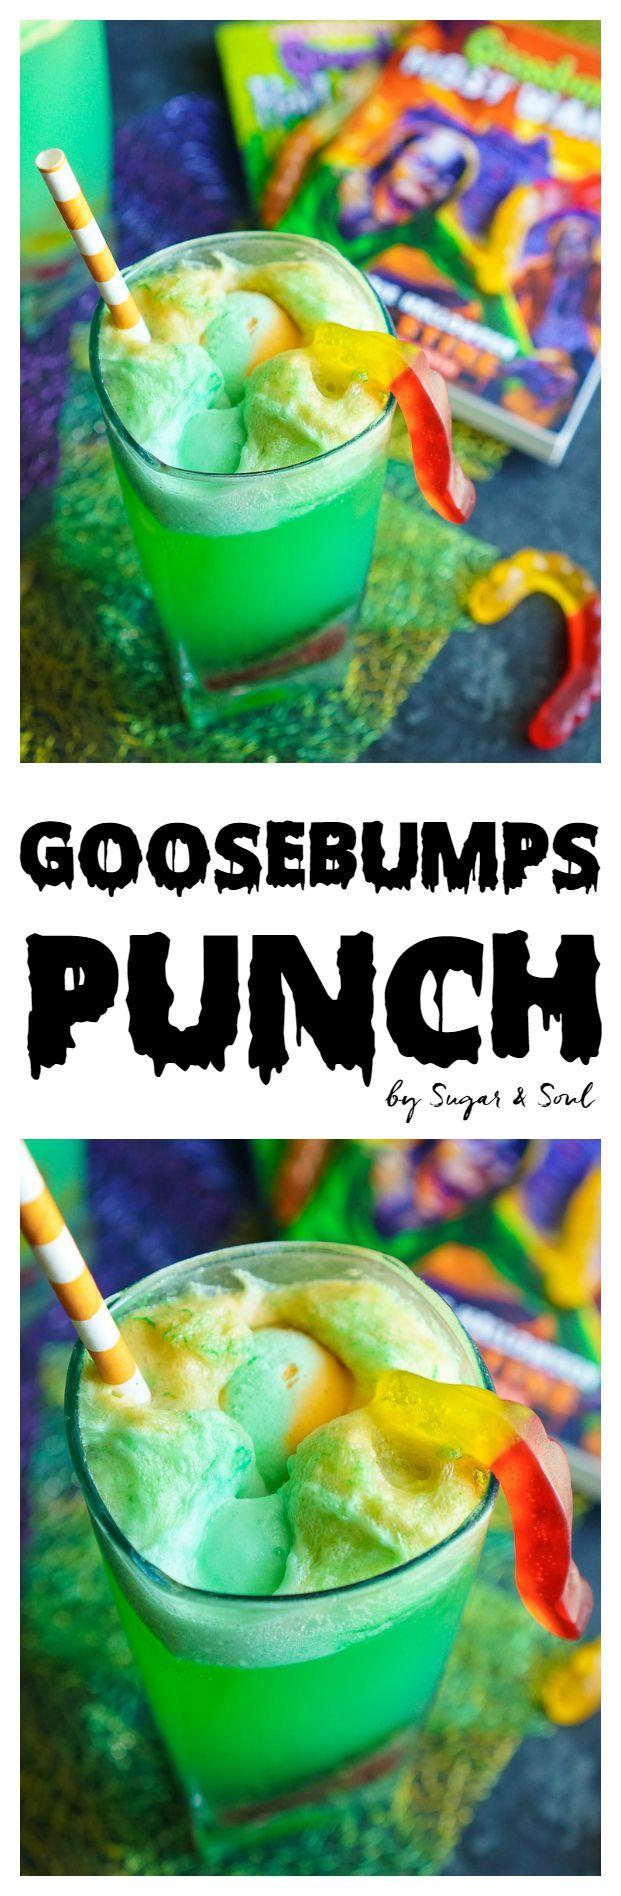 Goosebumps Punch